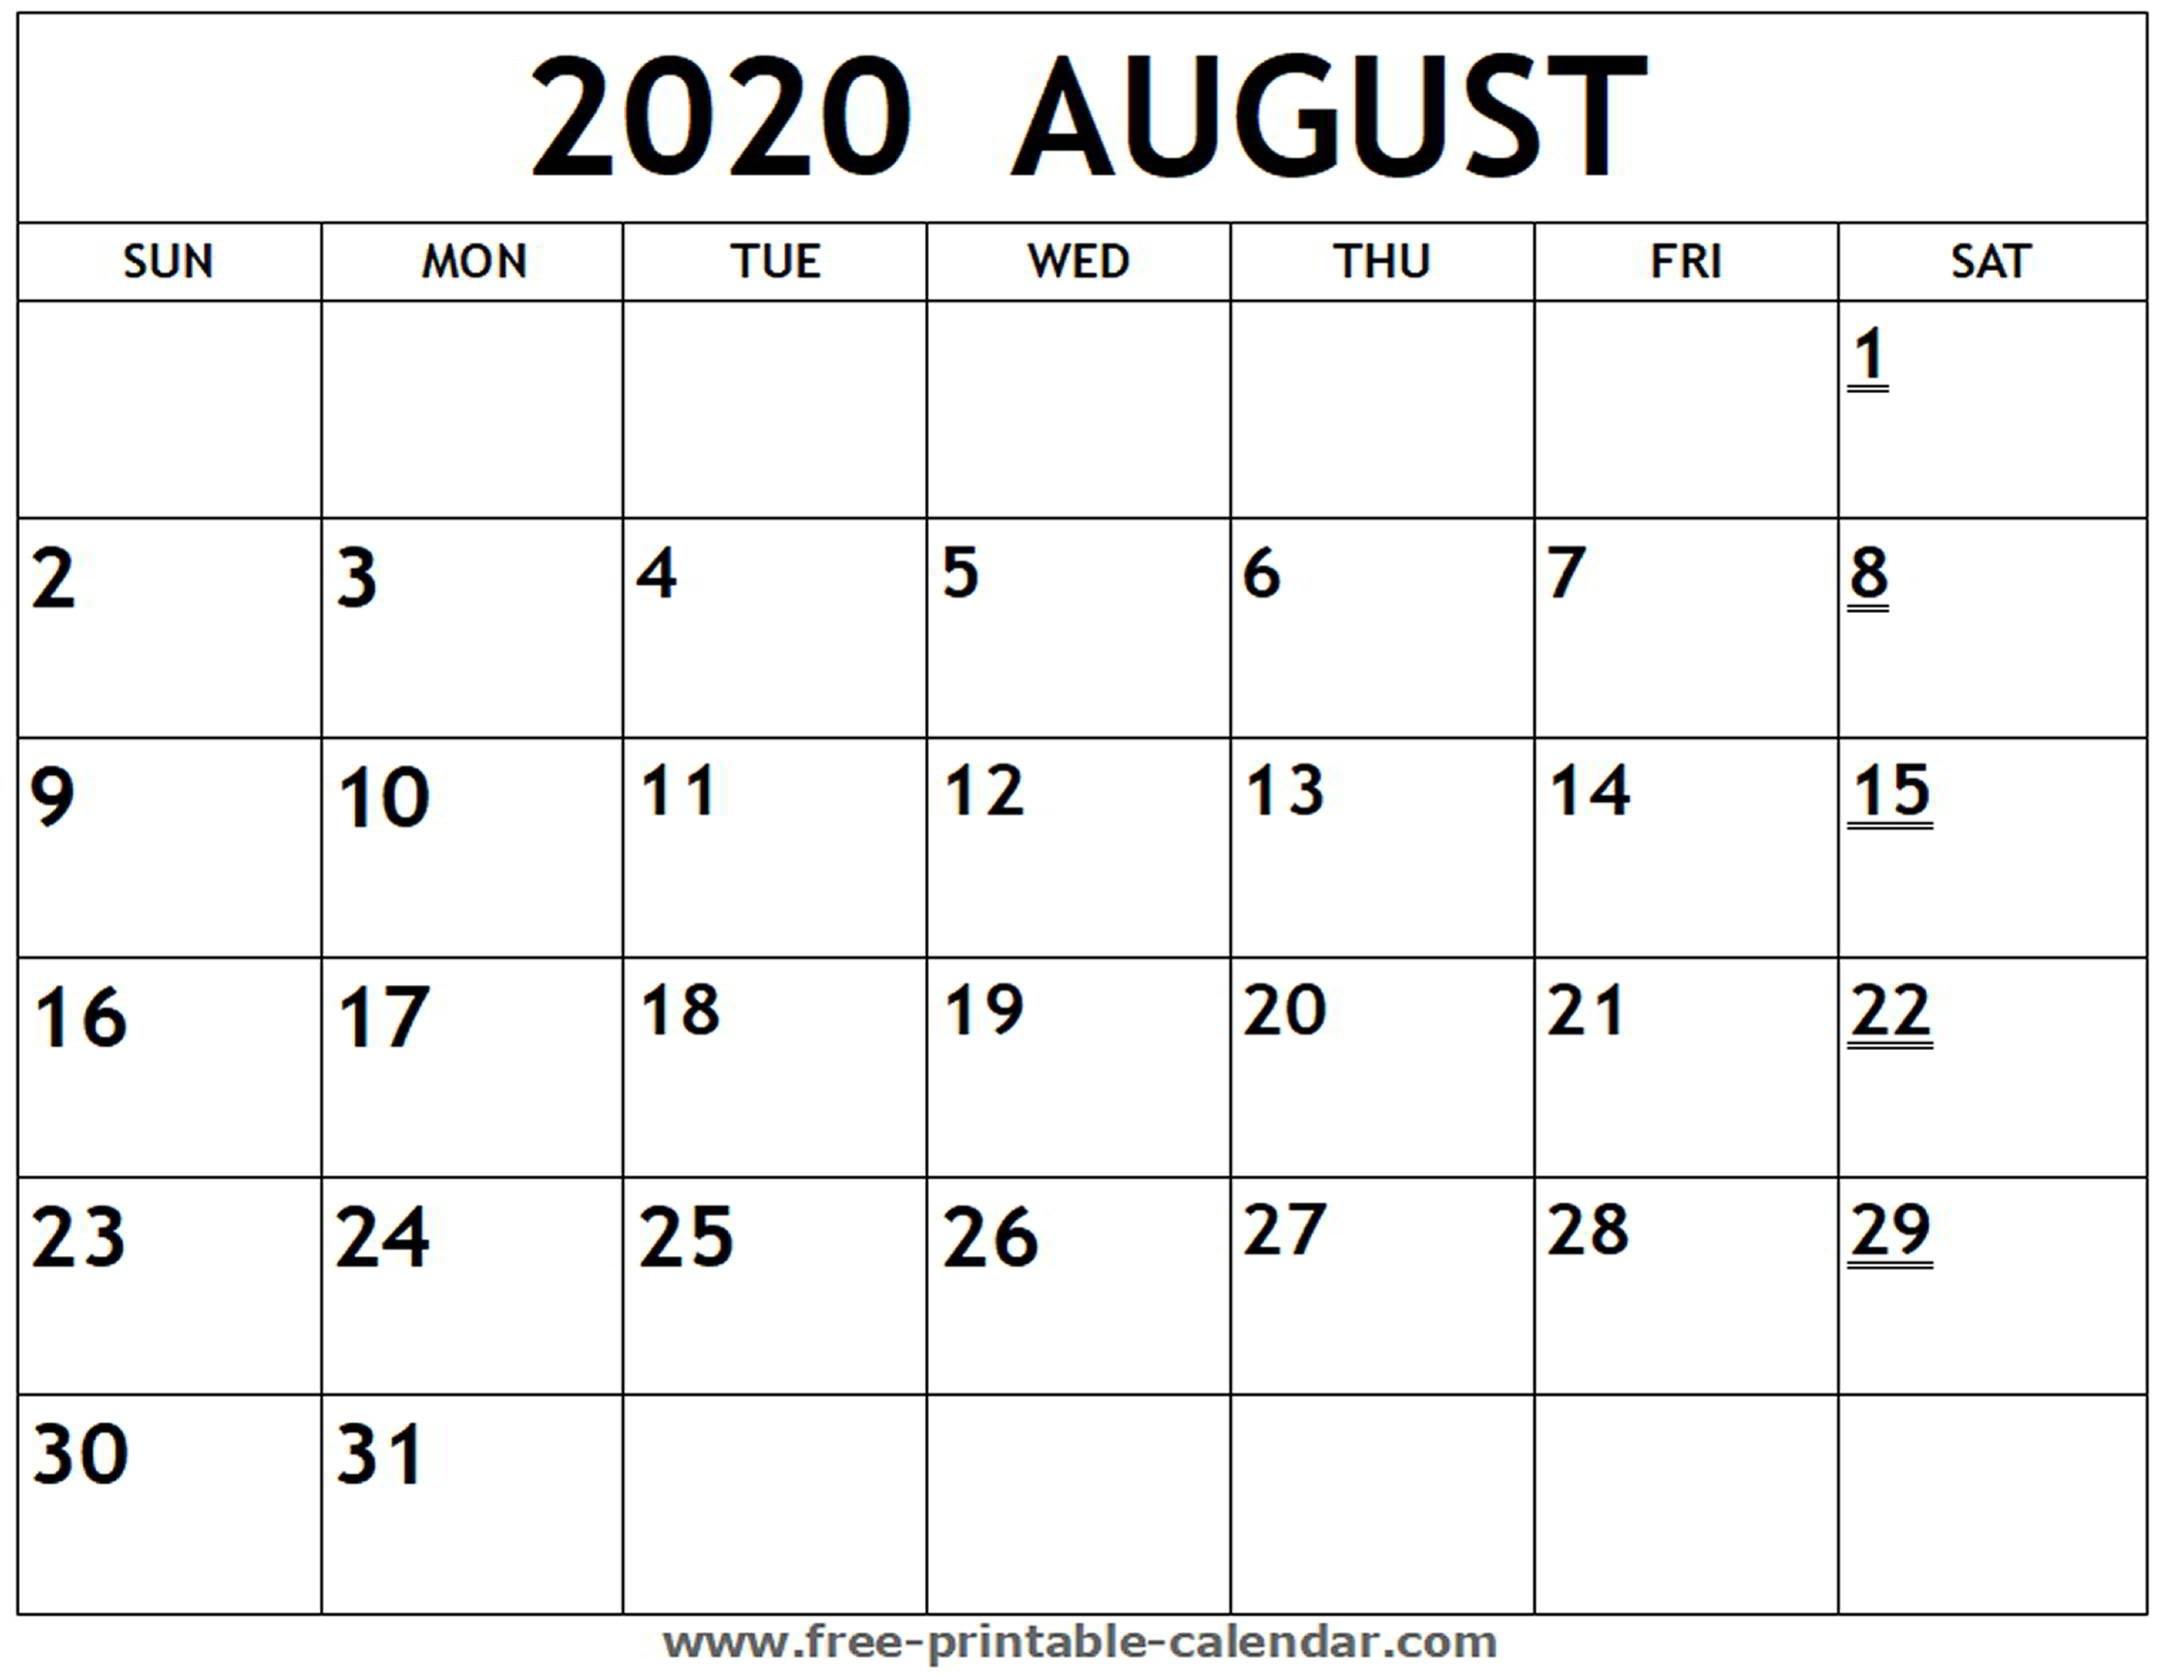 Blank Calendar 2020 August - Wpa.wpart.co-Blank Calendar Template June July August 2020